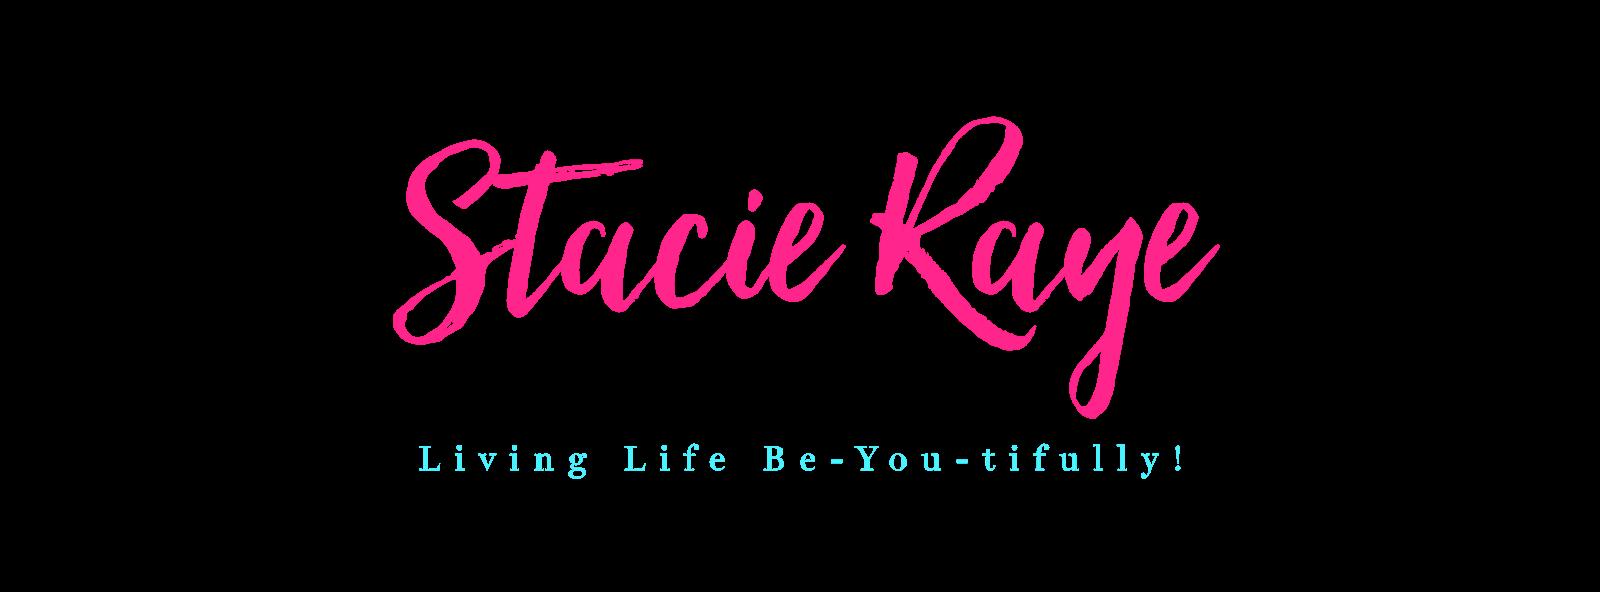 Stacie Raye